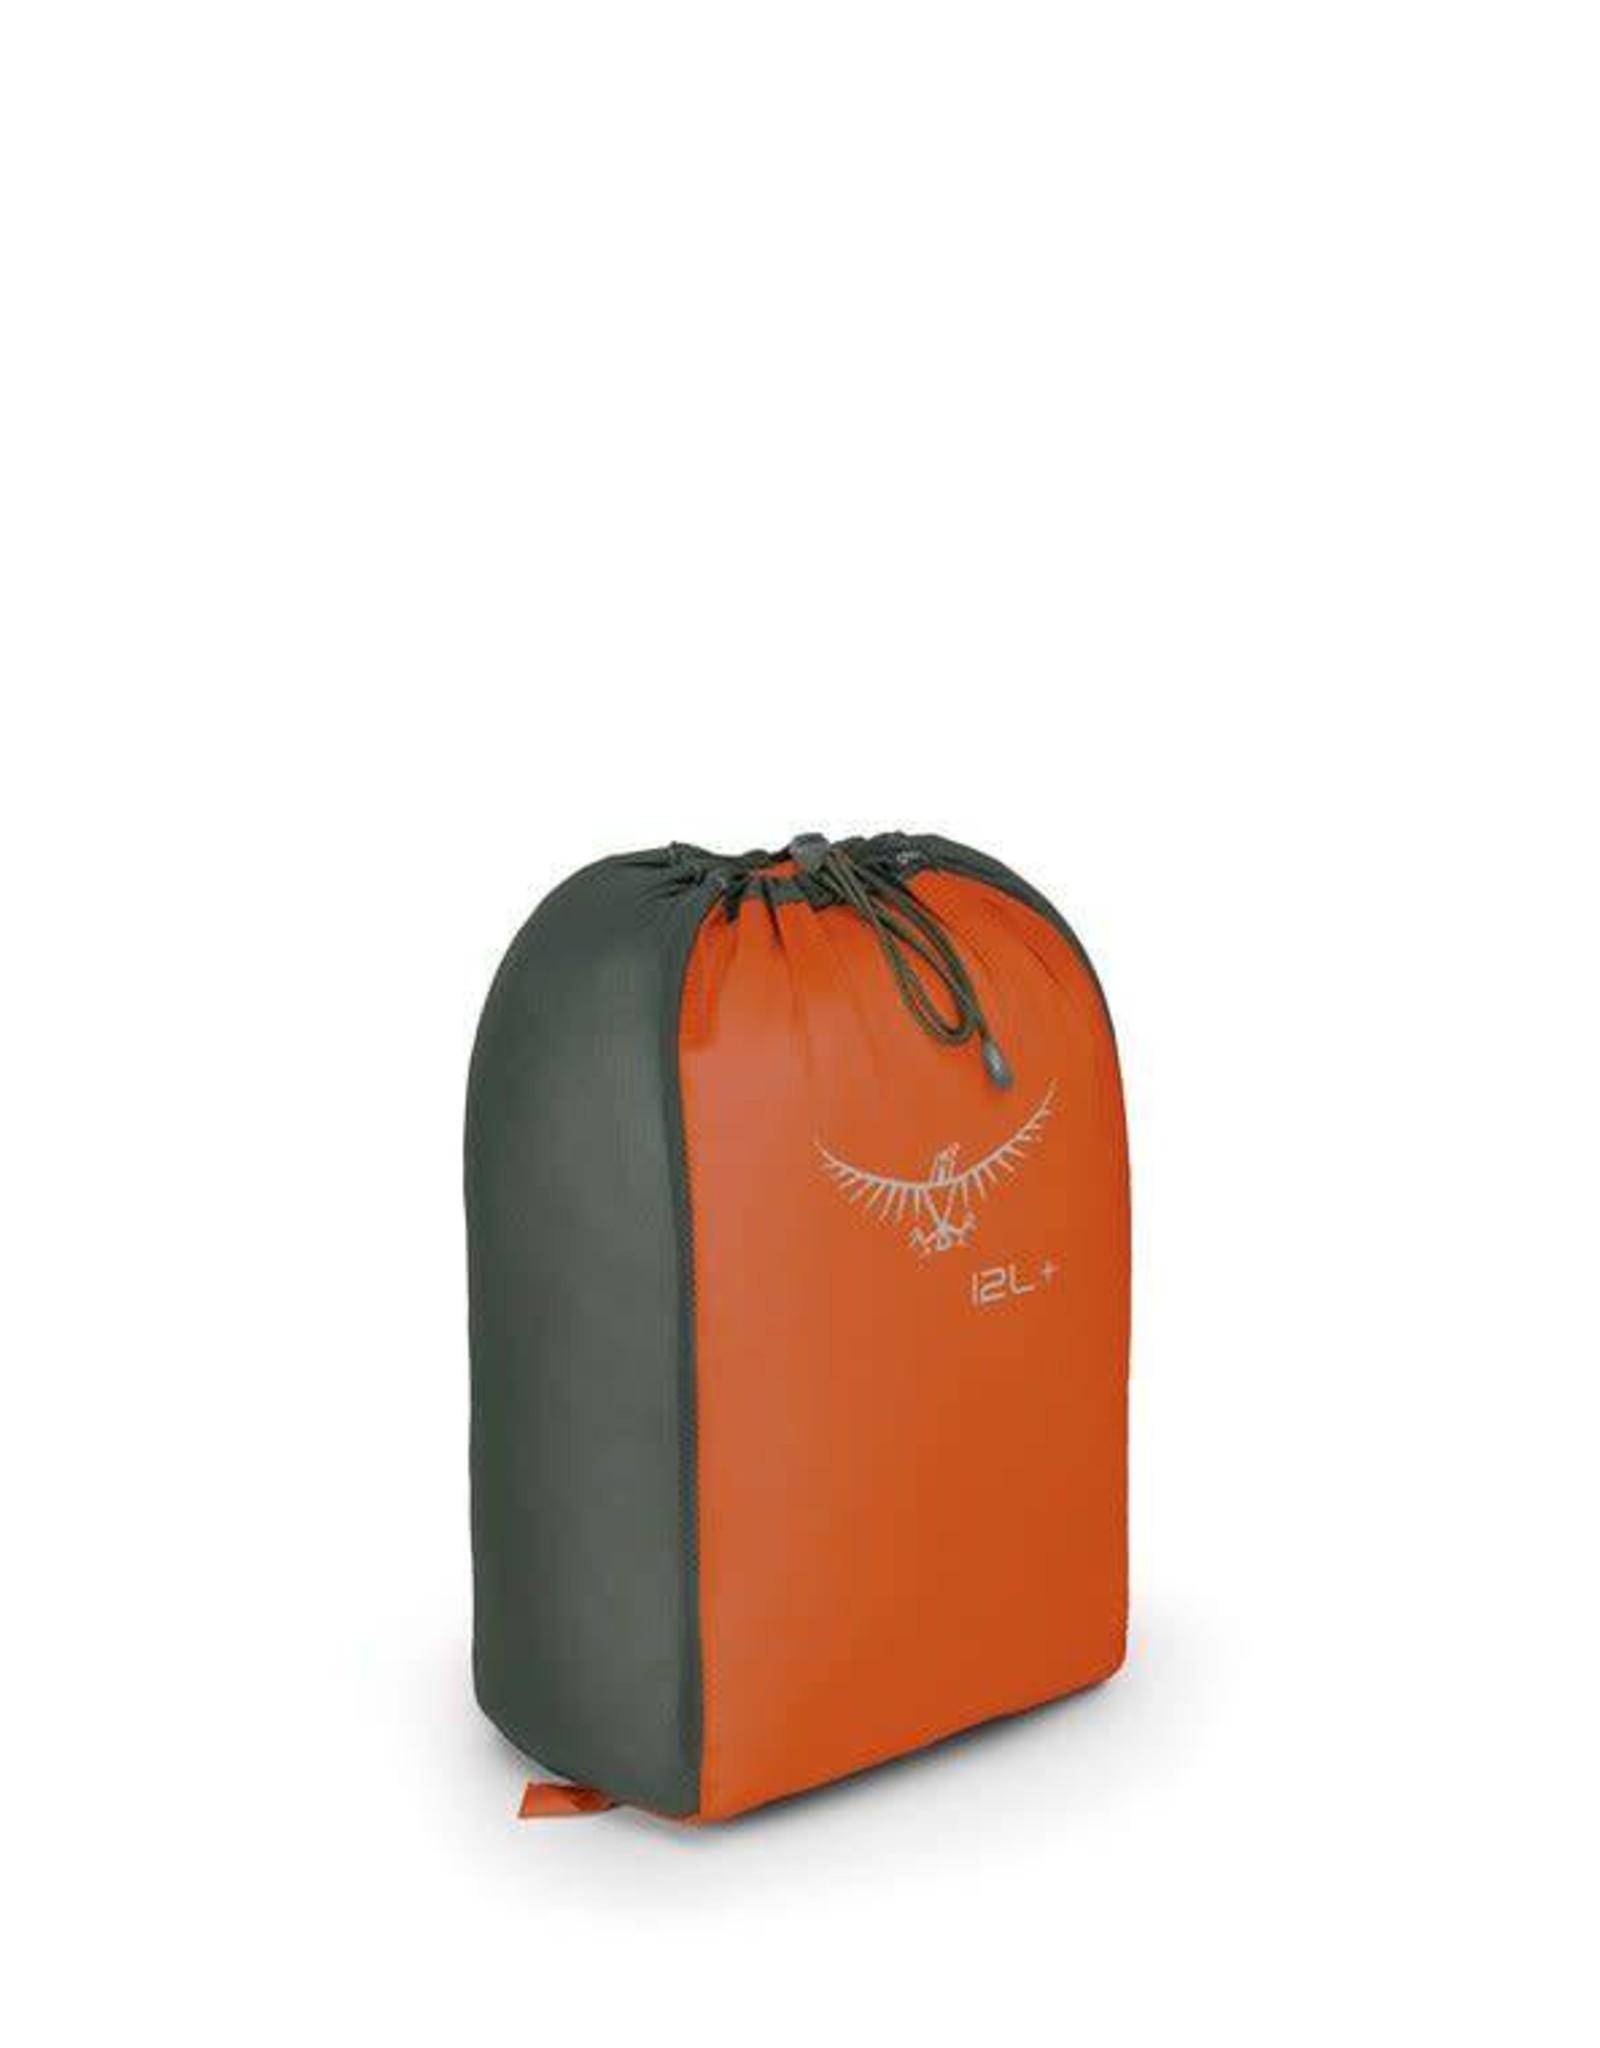 Osprey Osprey Ultralight Stuff Sack 12L